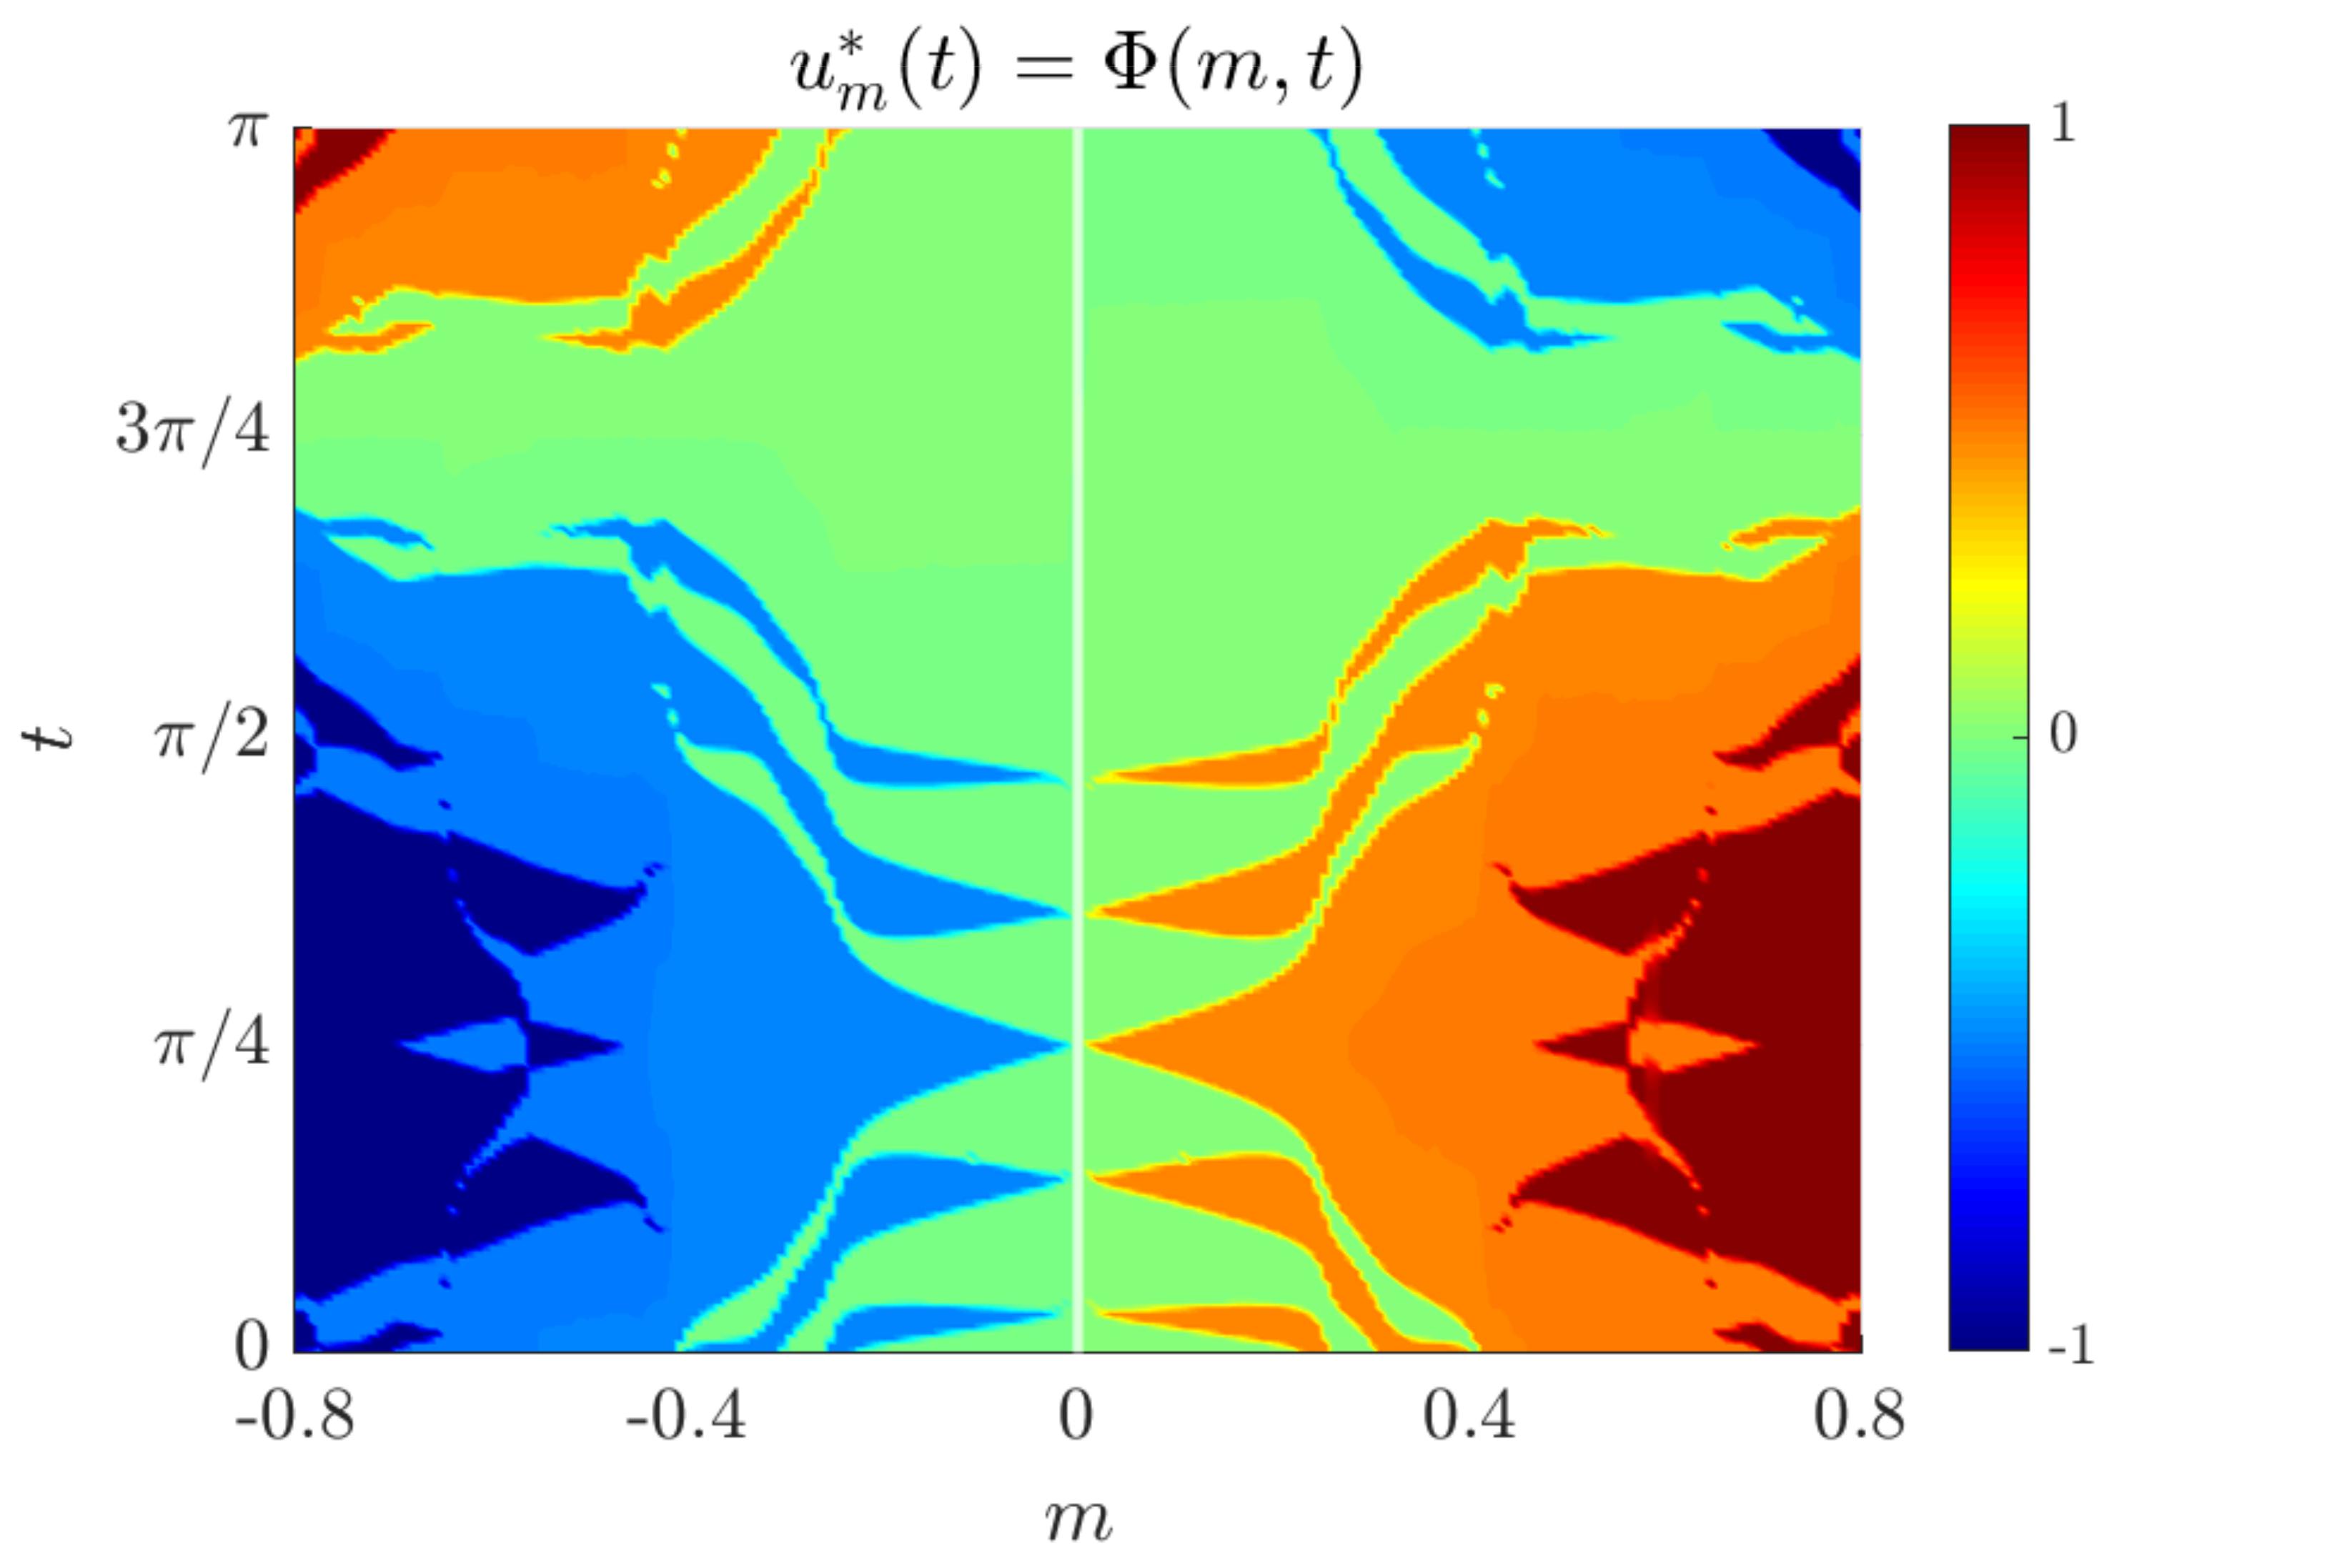 Figure 5. multilevel control for the SHM problem